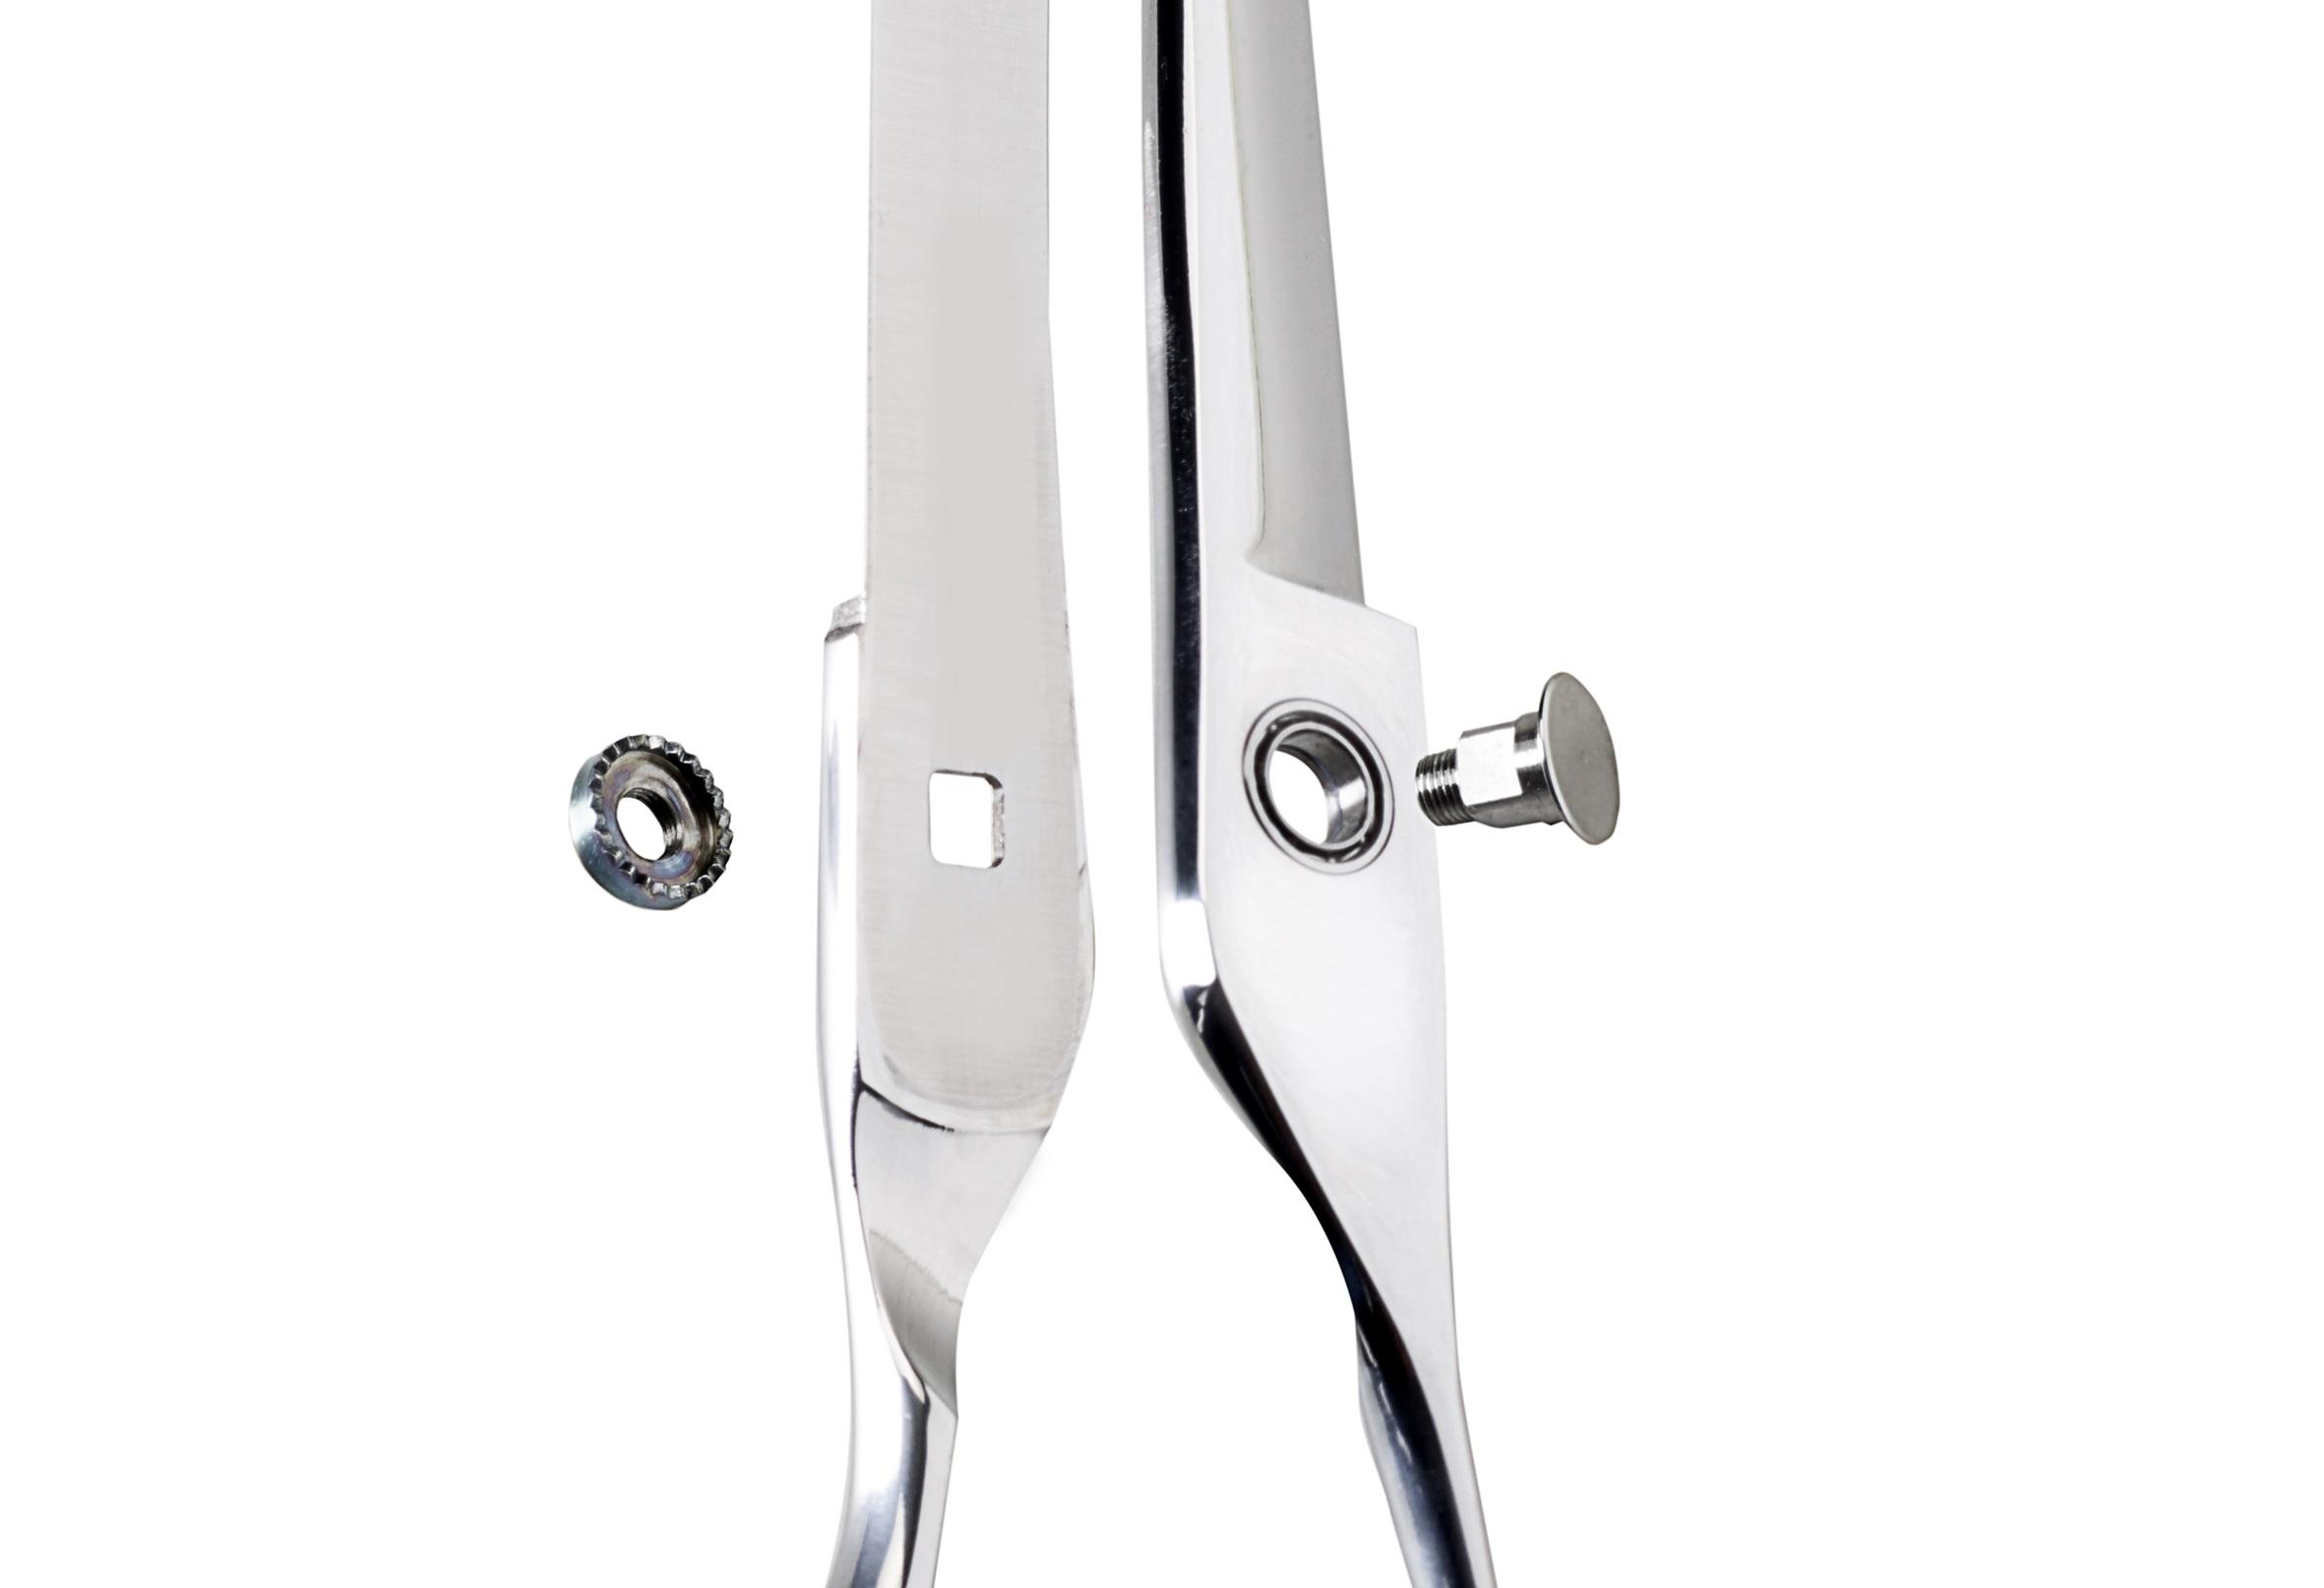 Kiepe Hairdresser Scissors Razor Edge Regular 2814 - profesionálne kadernícke nožnice